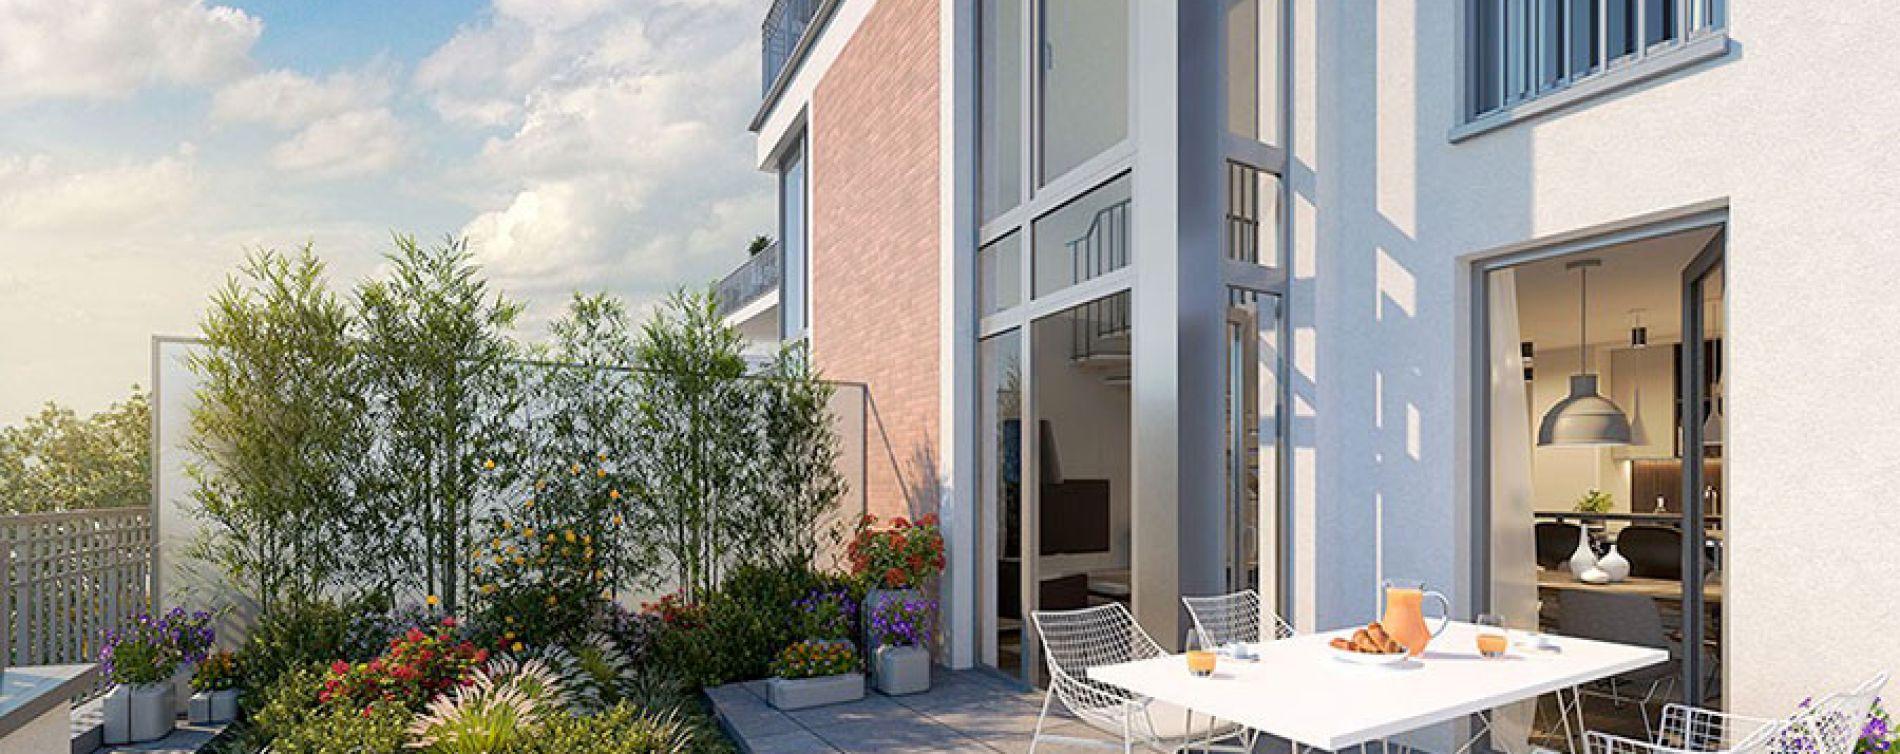 Saint-Maurice : programme immobilier neuve « Panoramiq' » (4)